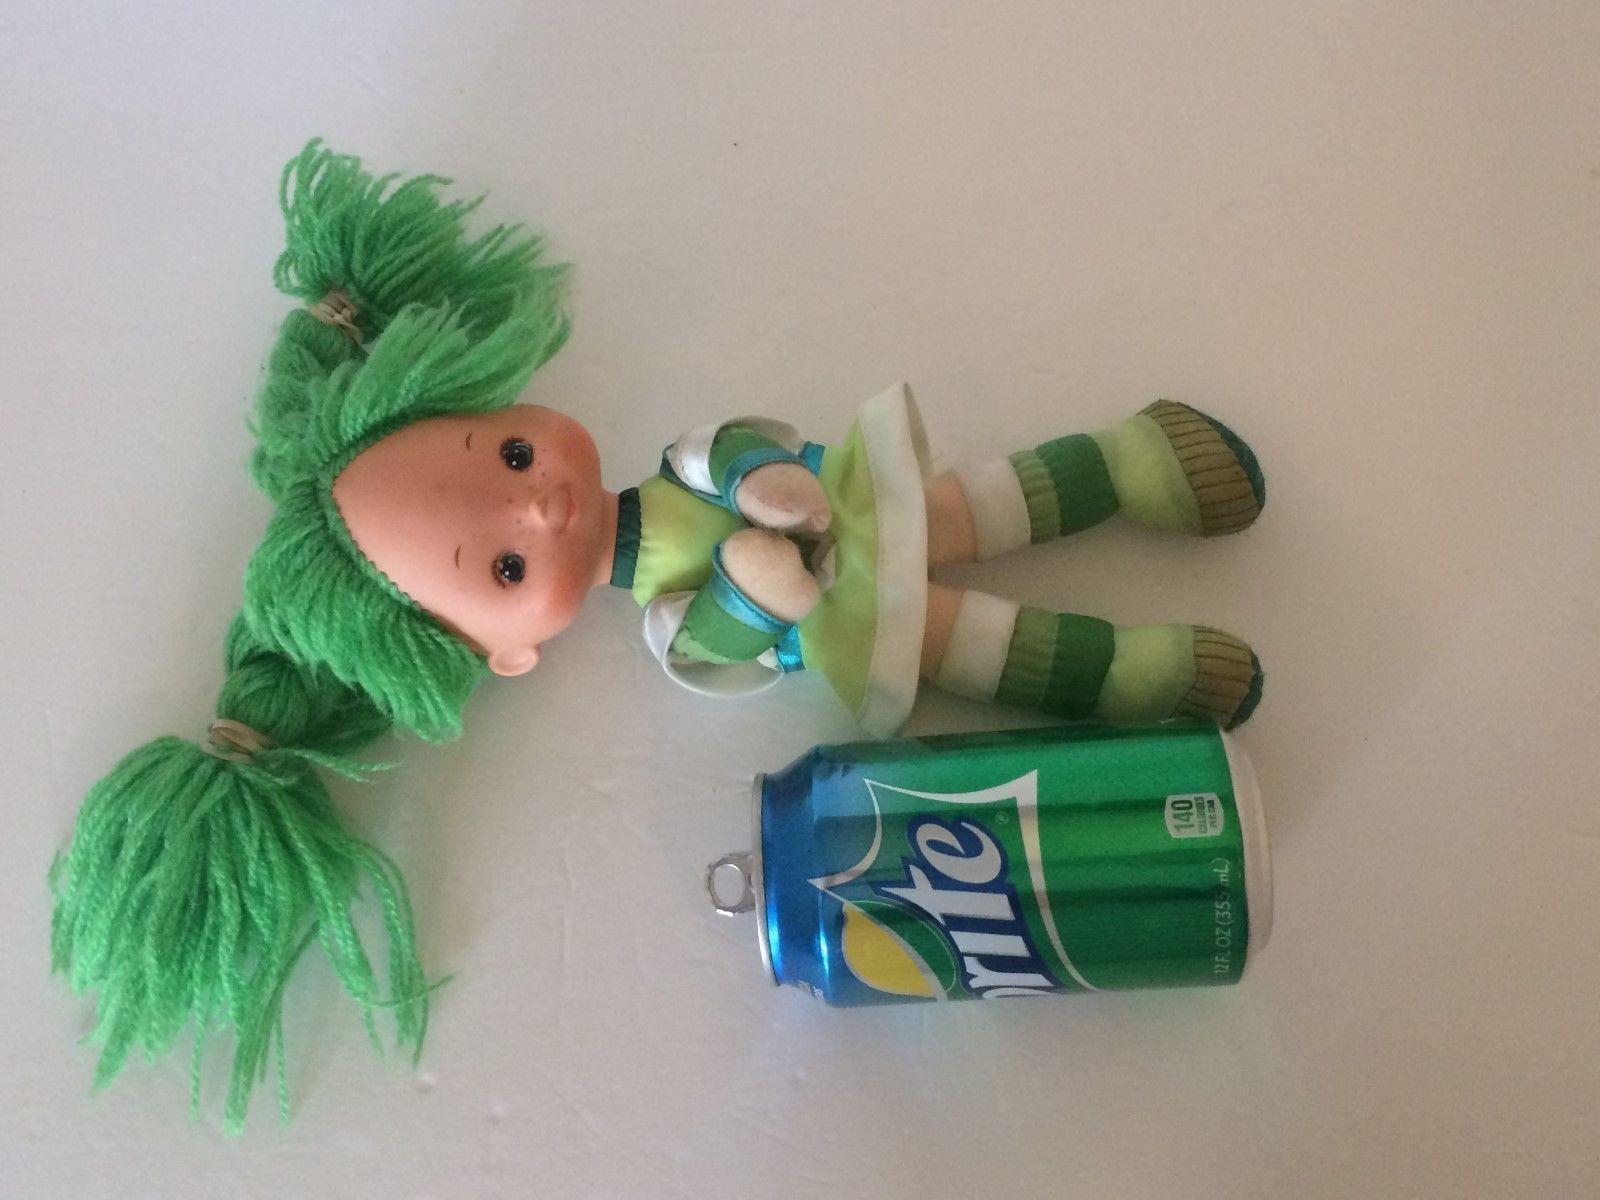 SOLD 1983 Hallmark Rainbow Brite Patty O'Green Doll